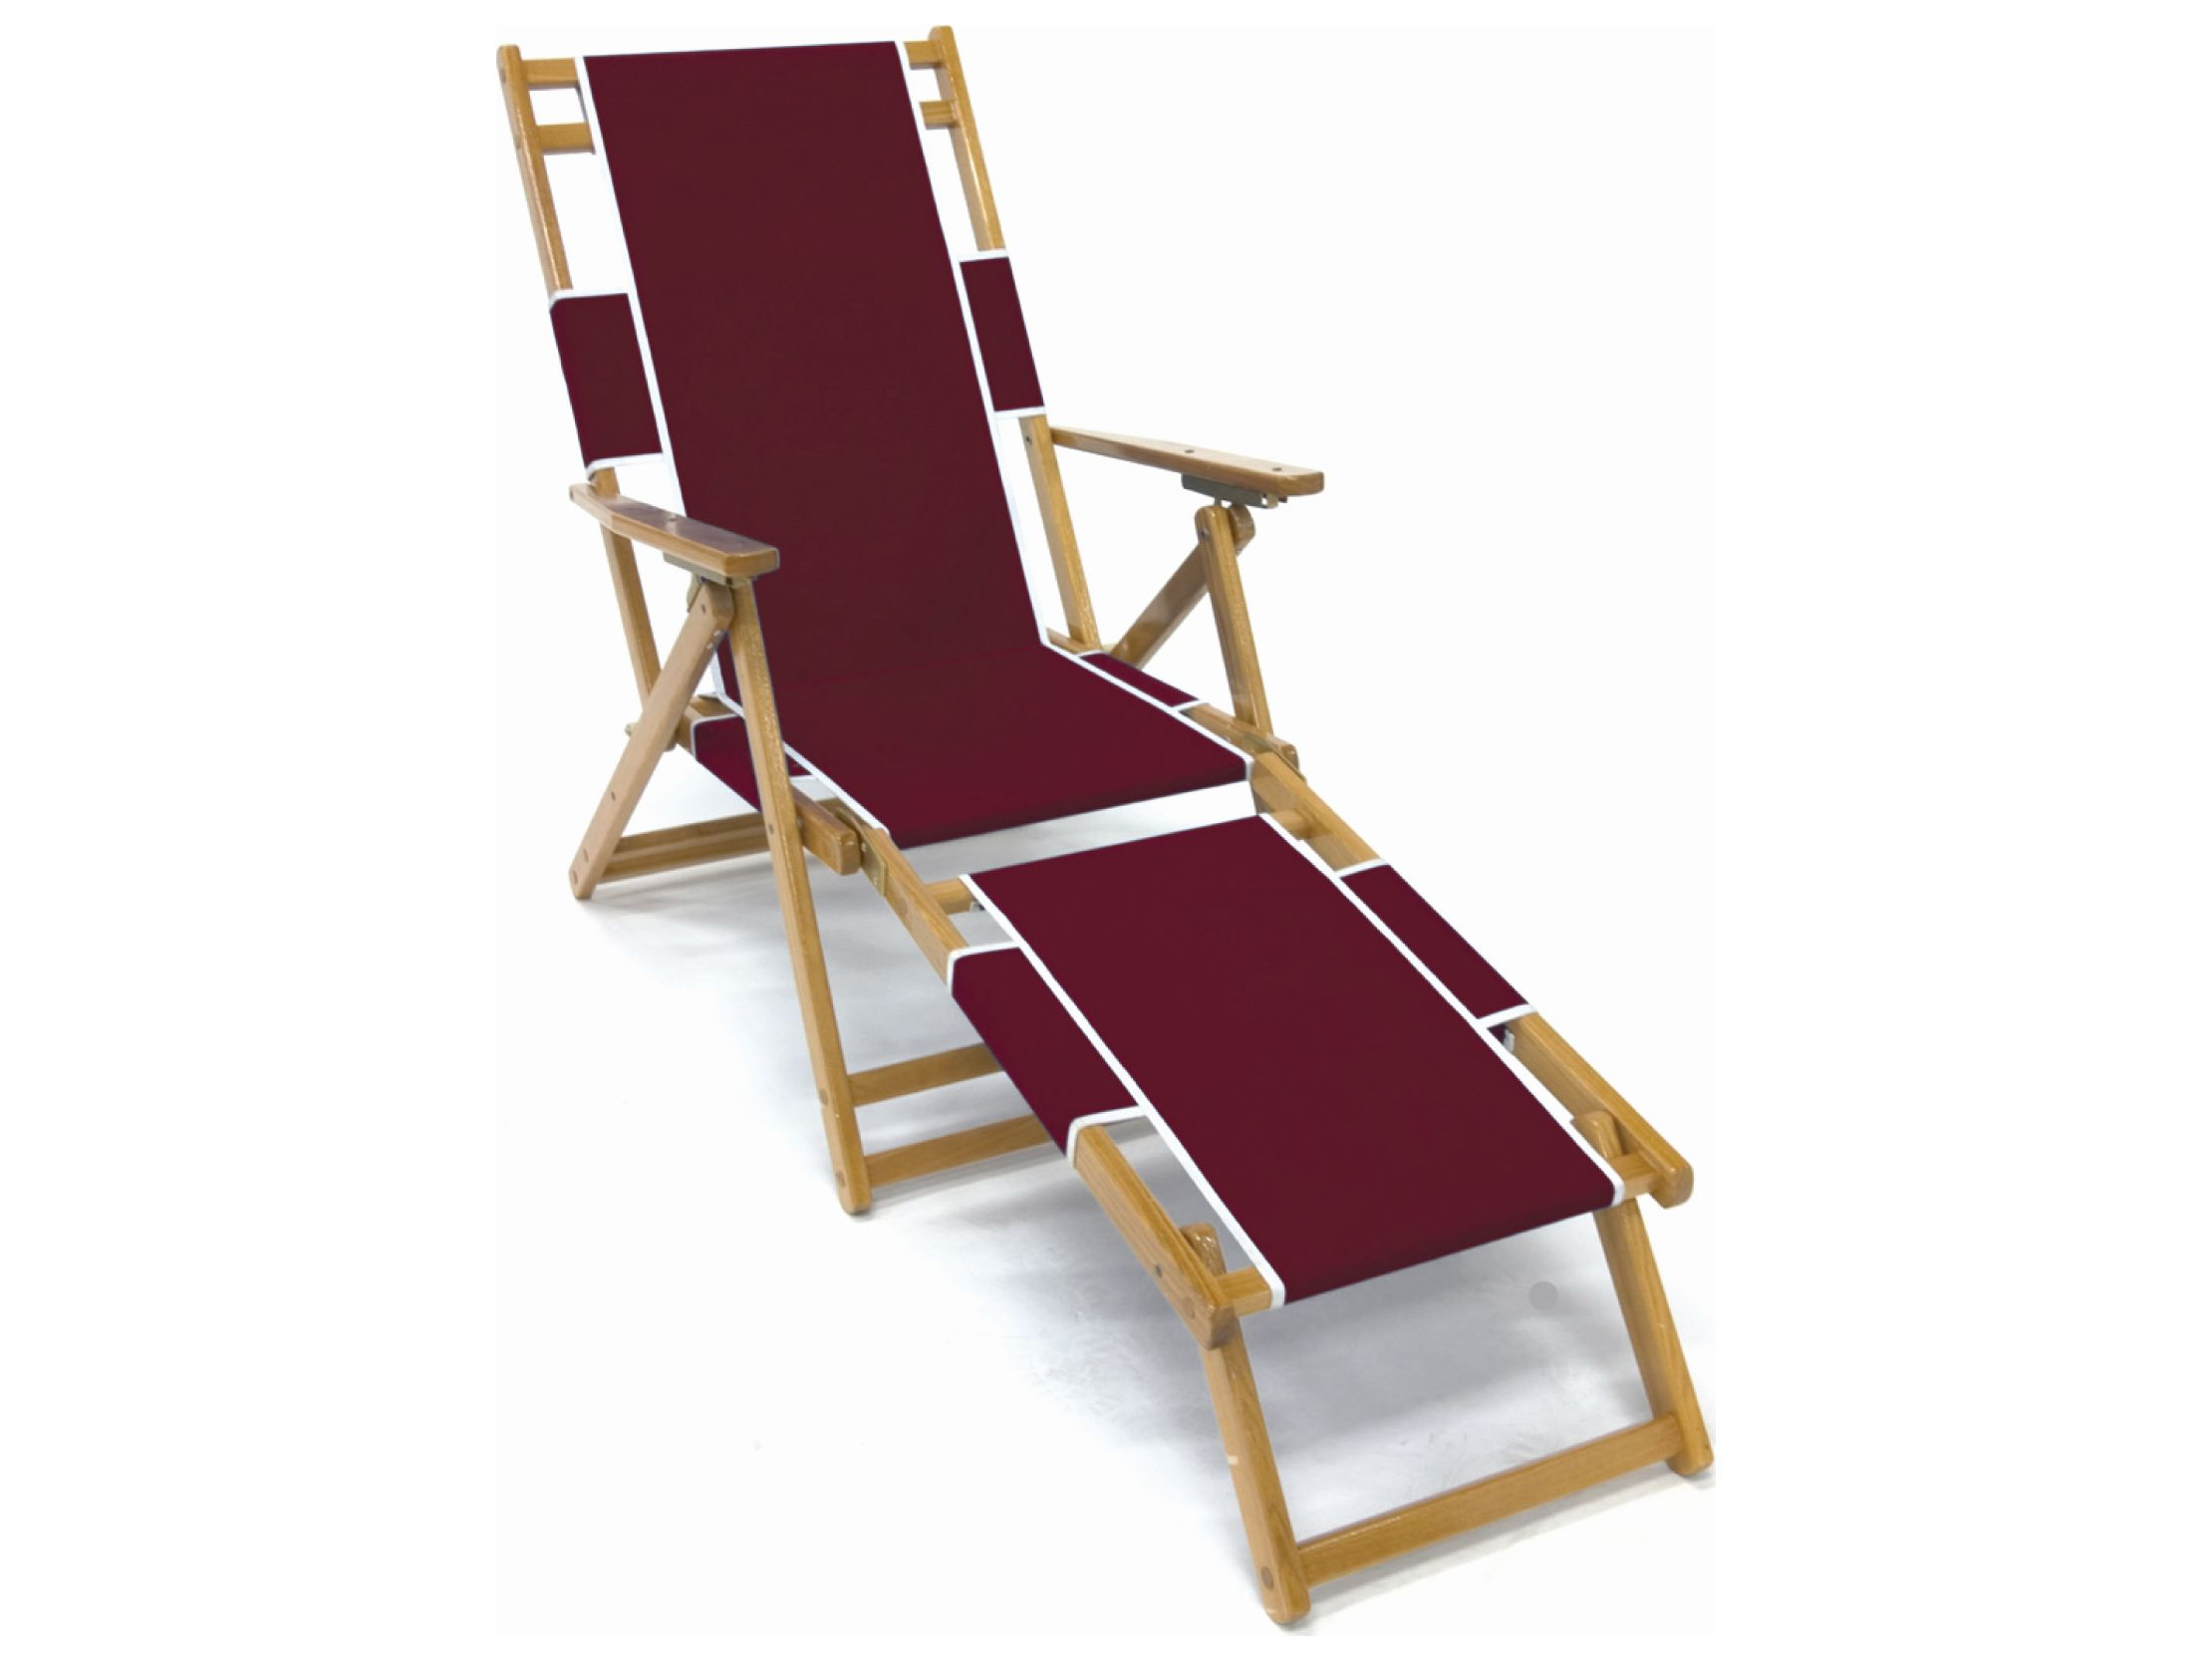 Frankford umbrellas oak wood beach lounge chair with